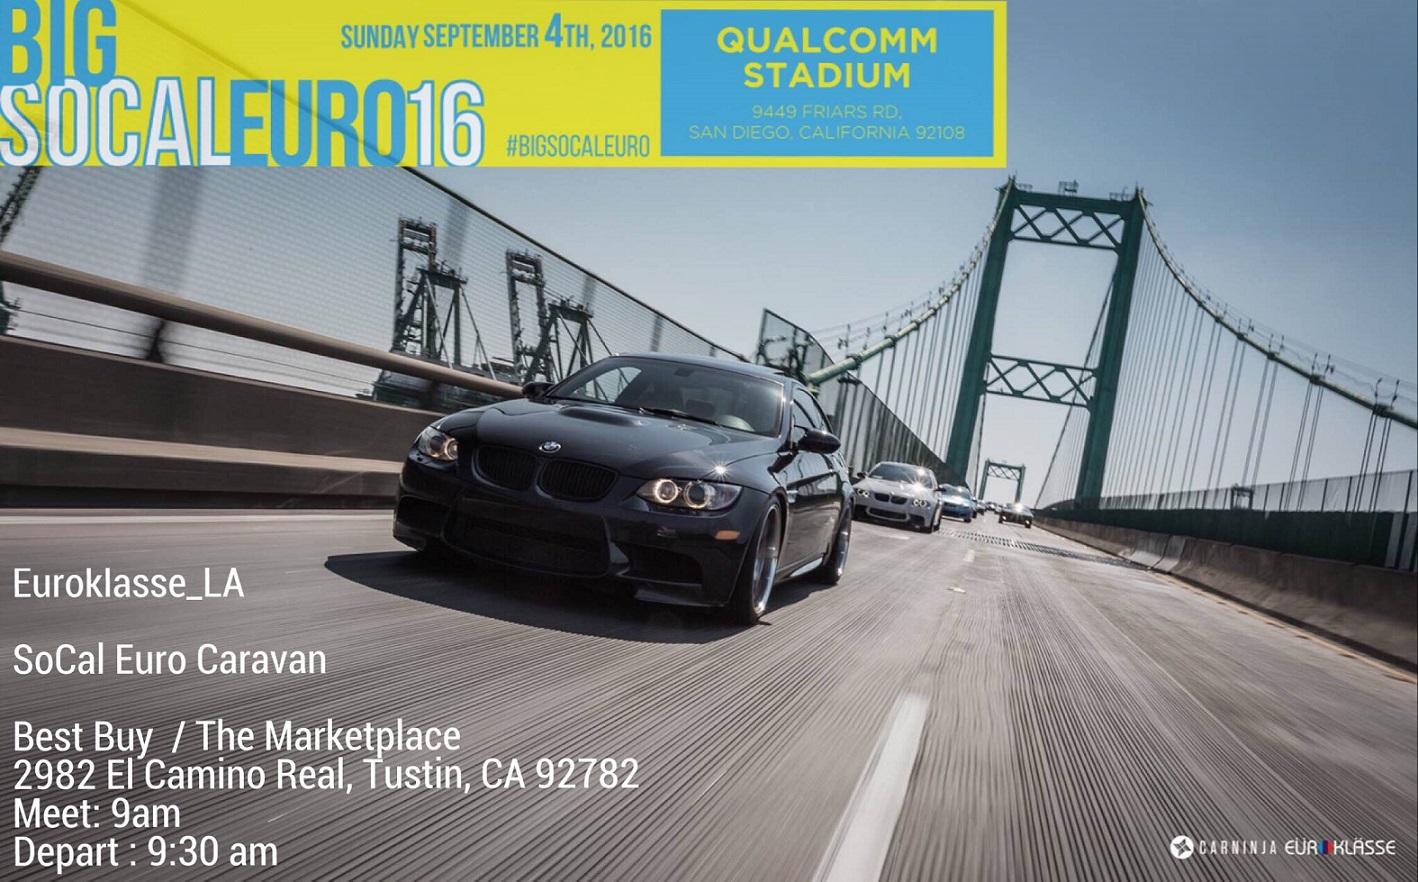 Euroklasse La Socal Euro 2016 Caravan To San Diego September 4 2016